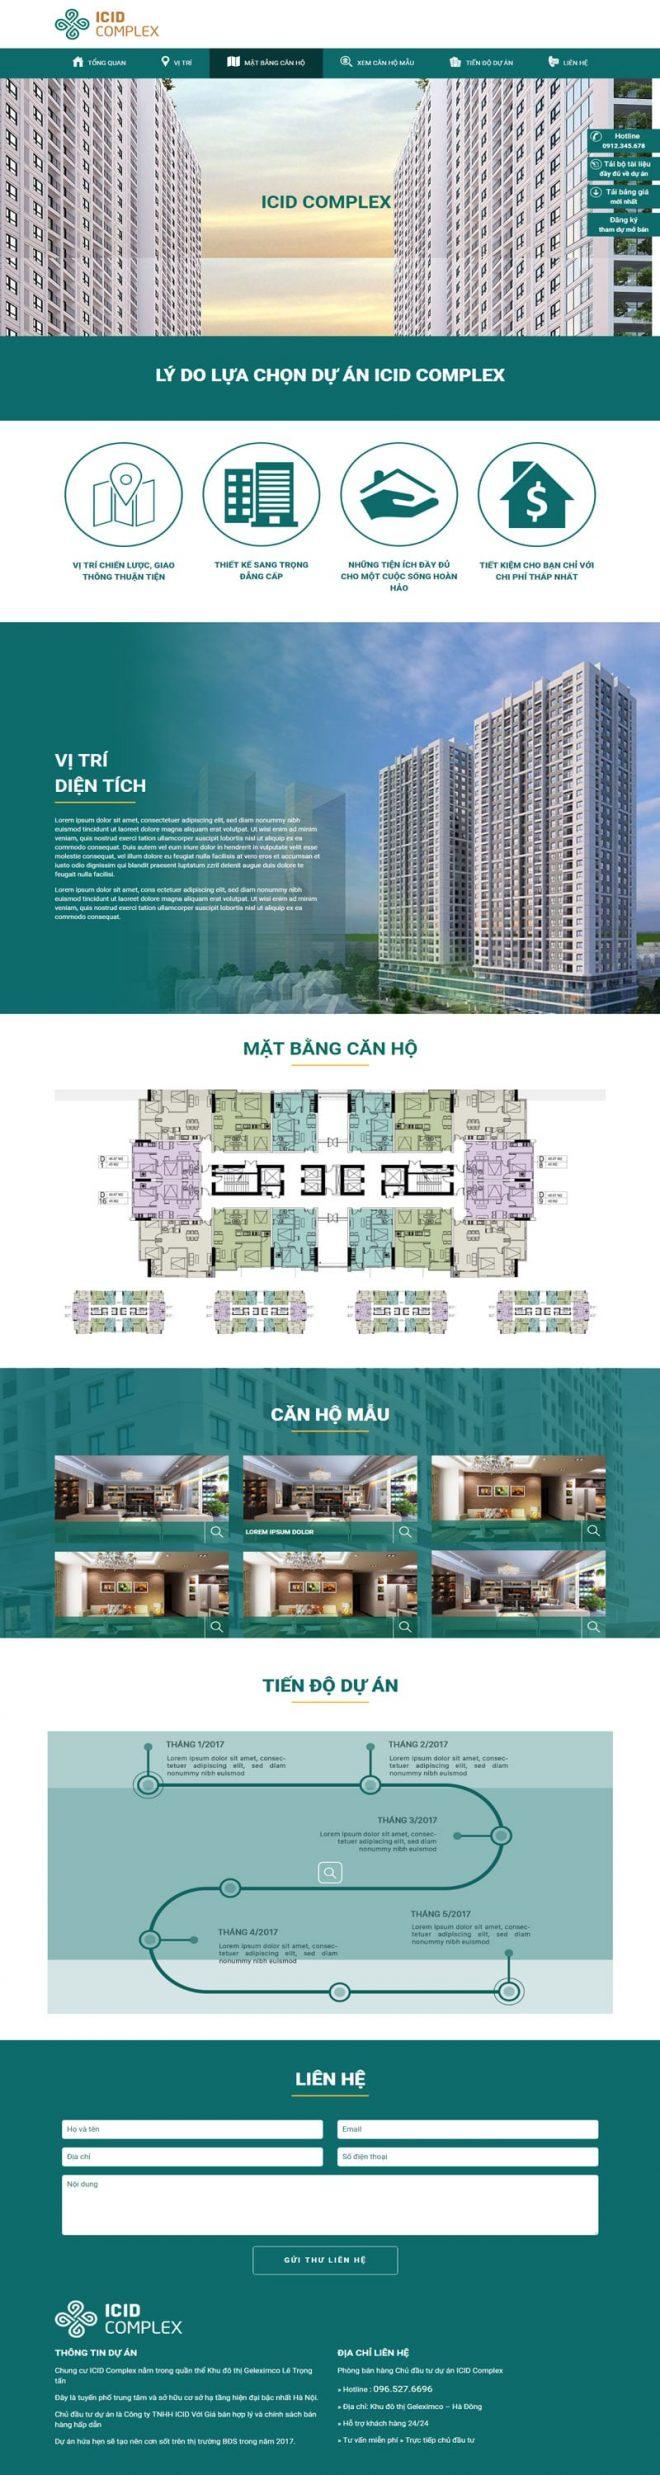 screencapture-batdongsan-mediaworks-vn-du-an-icid-complex-1500518878441